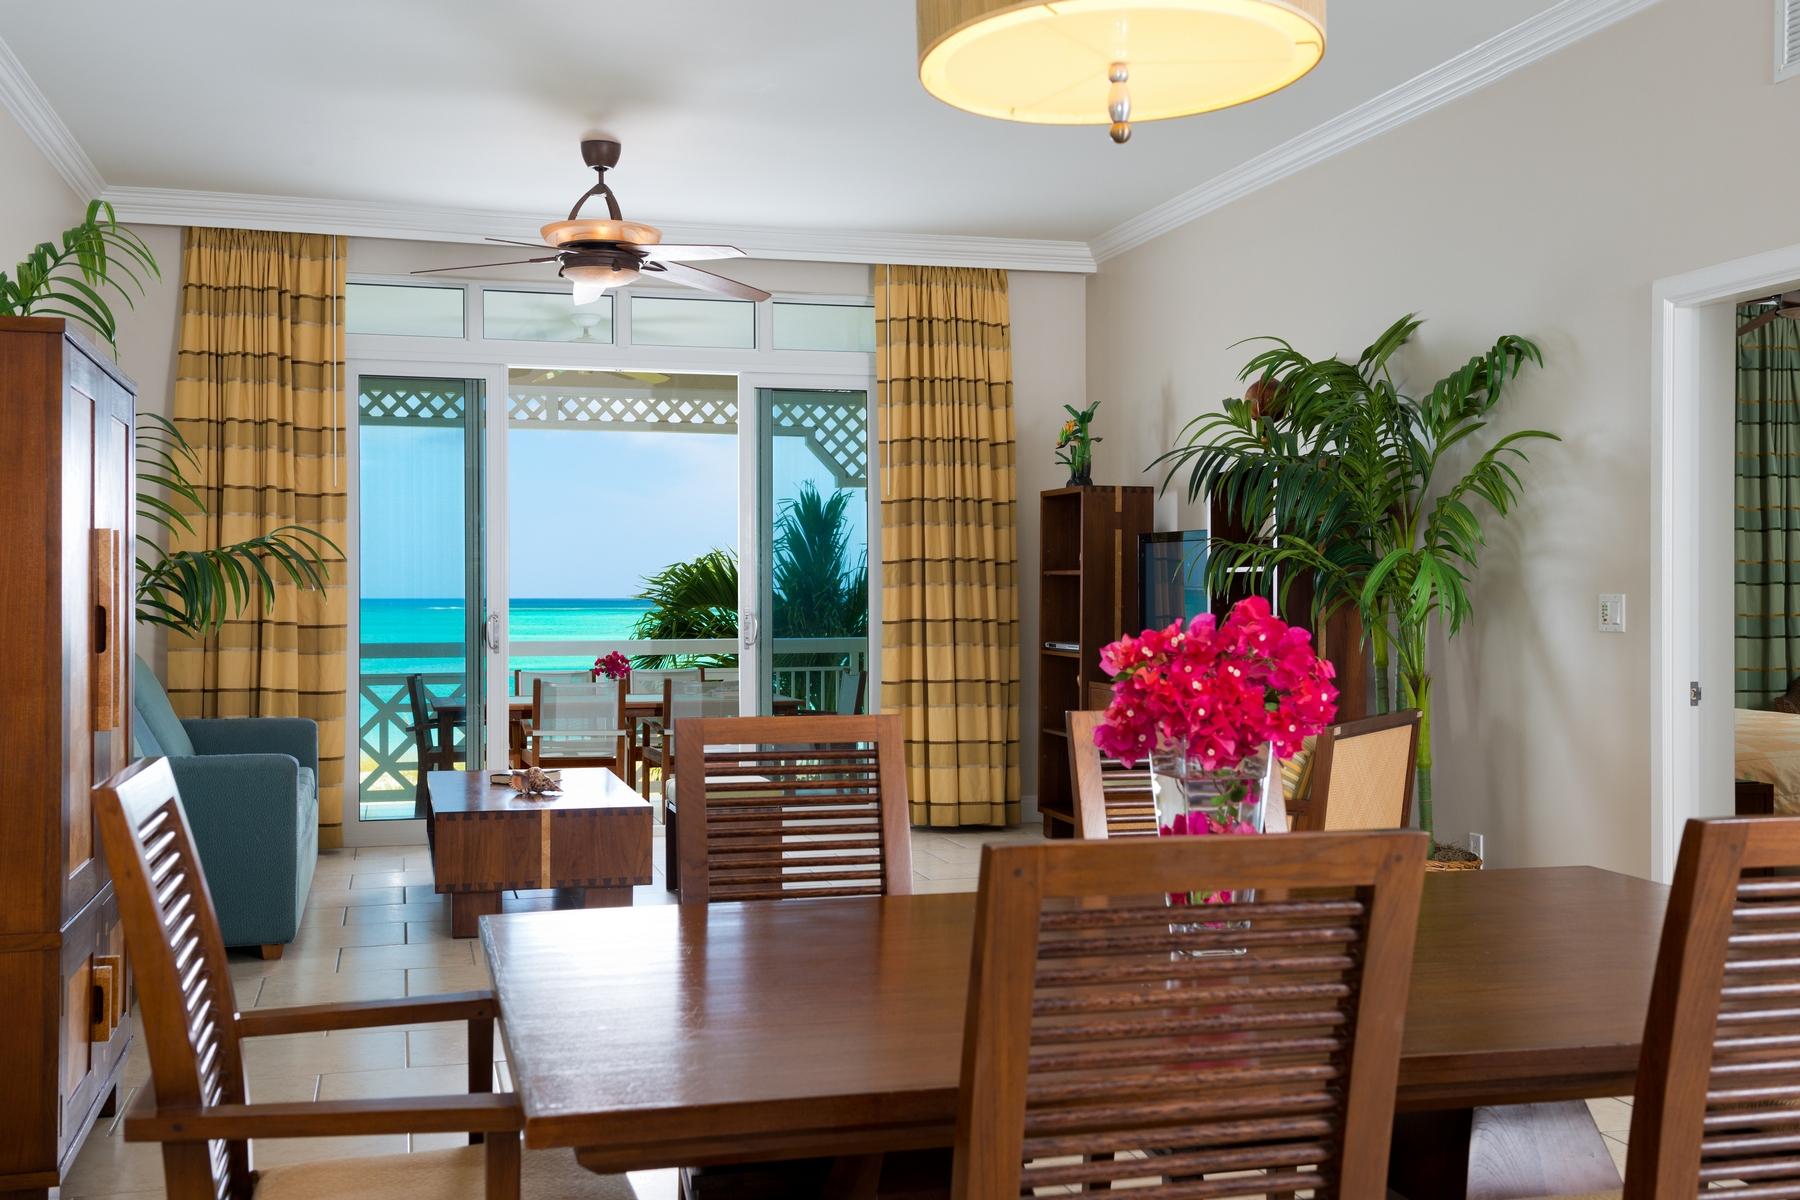 Additional photo for property listing at The Alexandra Resort - Suite 2202 Alexandra Resort, Grace Bay, Провиденсьялес Теркс И Кайкос